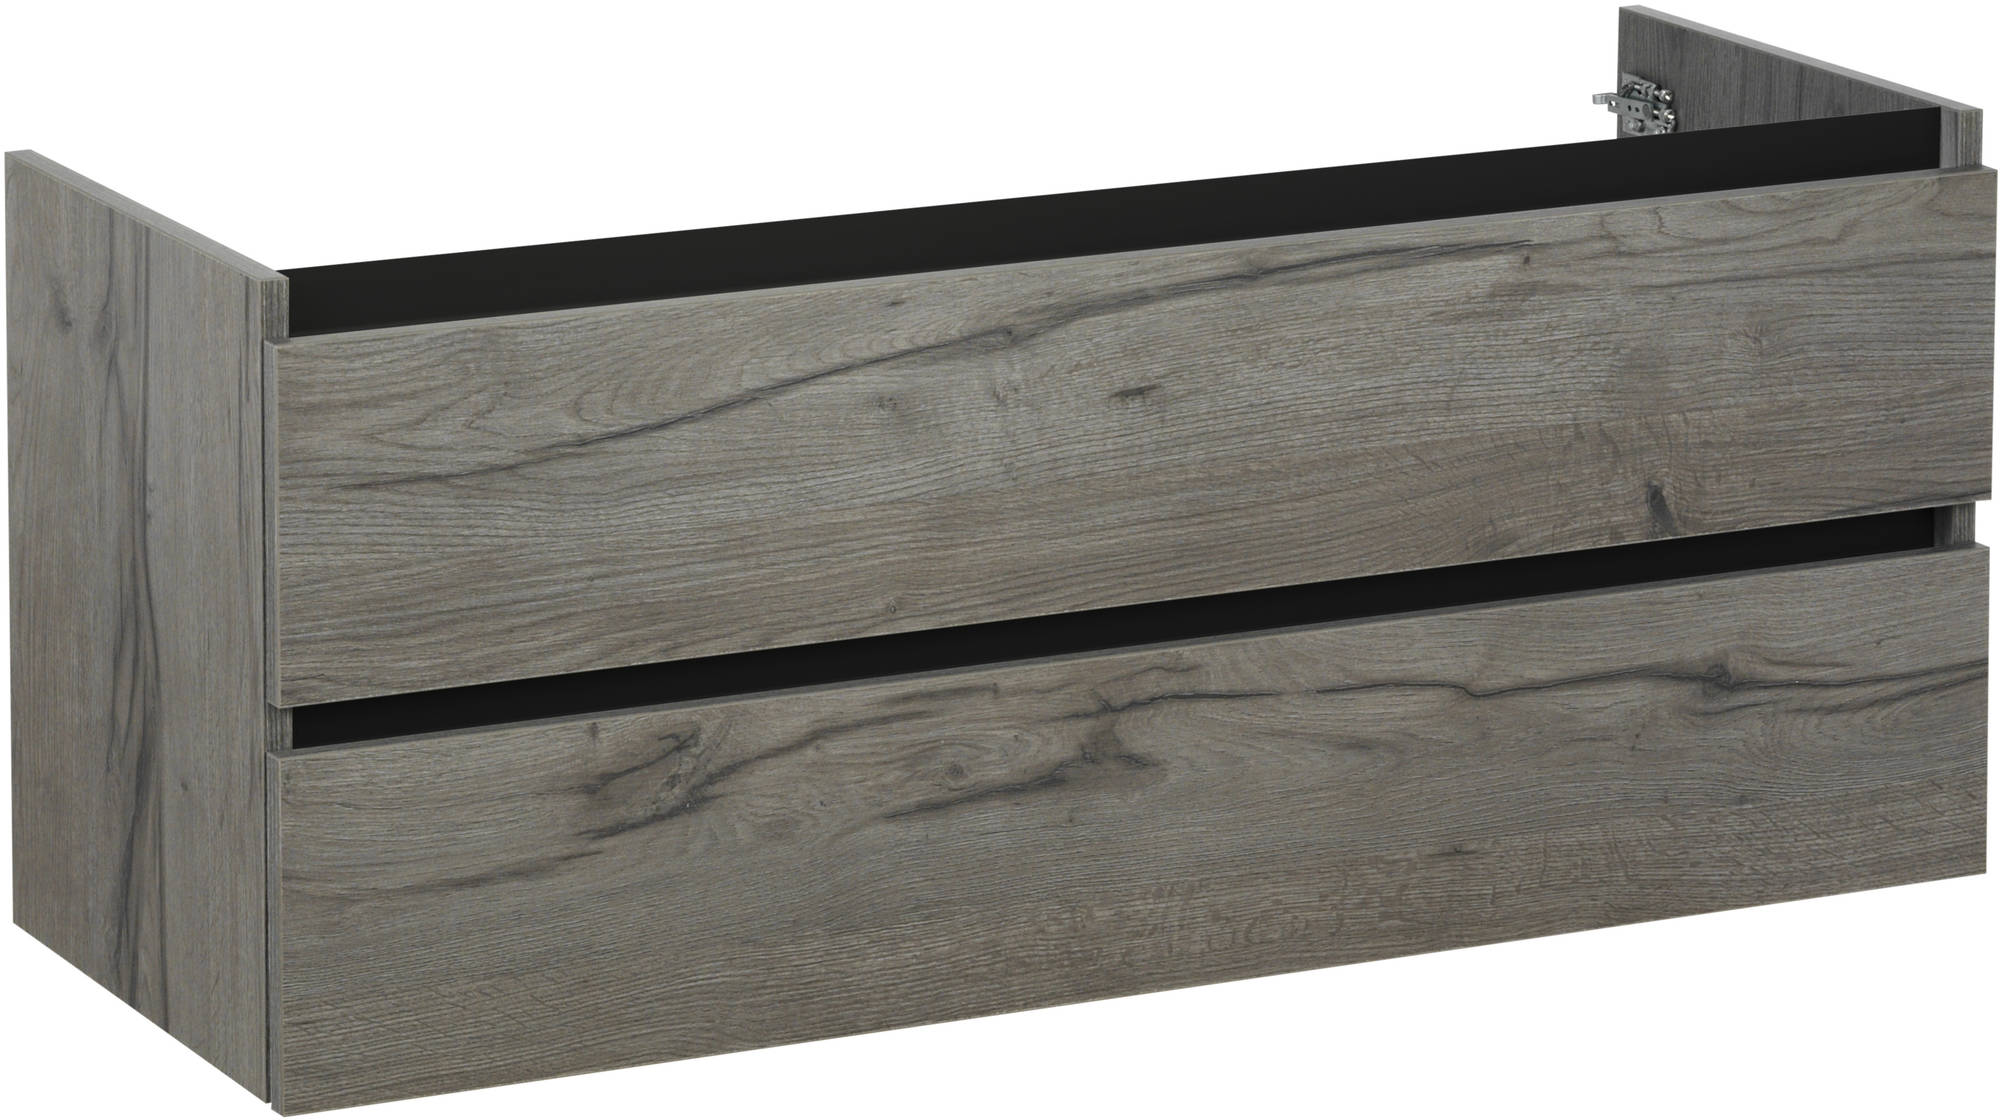 Ben Limara Wastafelonderkast 2 laden, 120x44,5x50 cm, Cape Elm/Mat Zwart